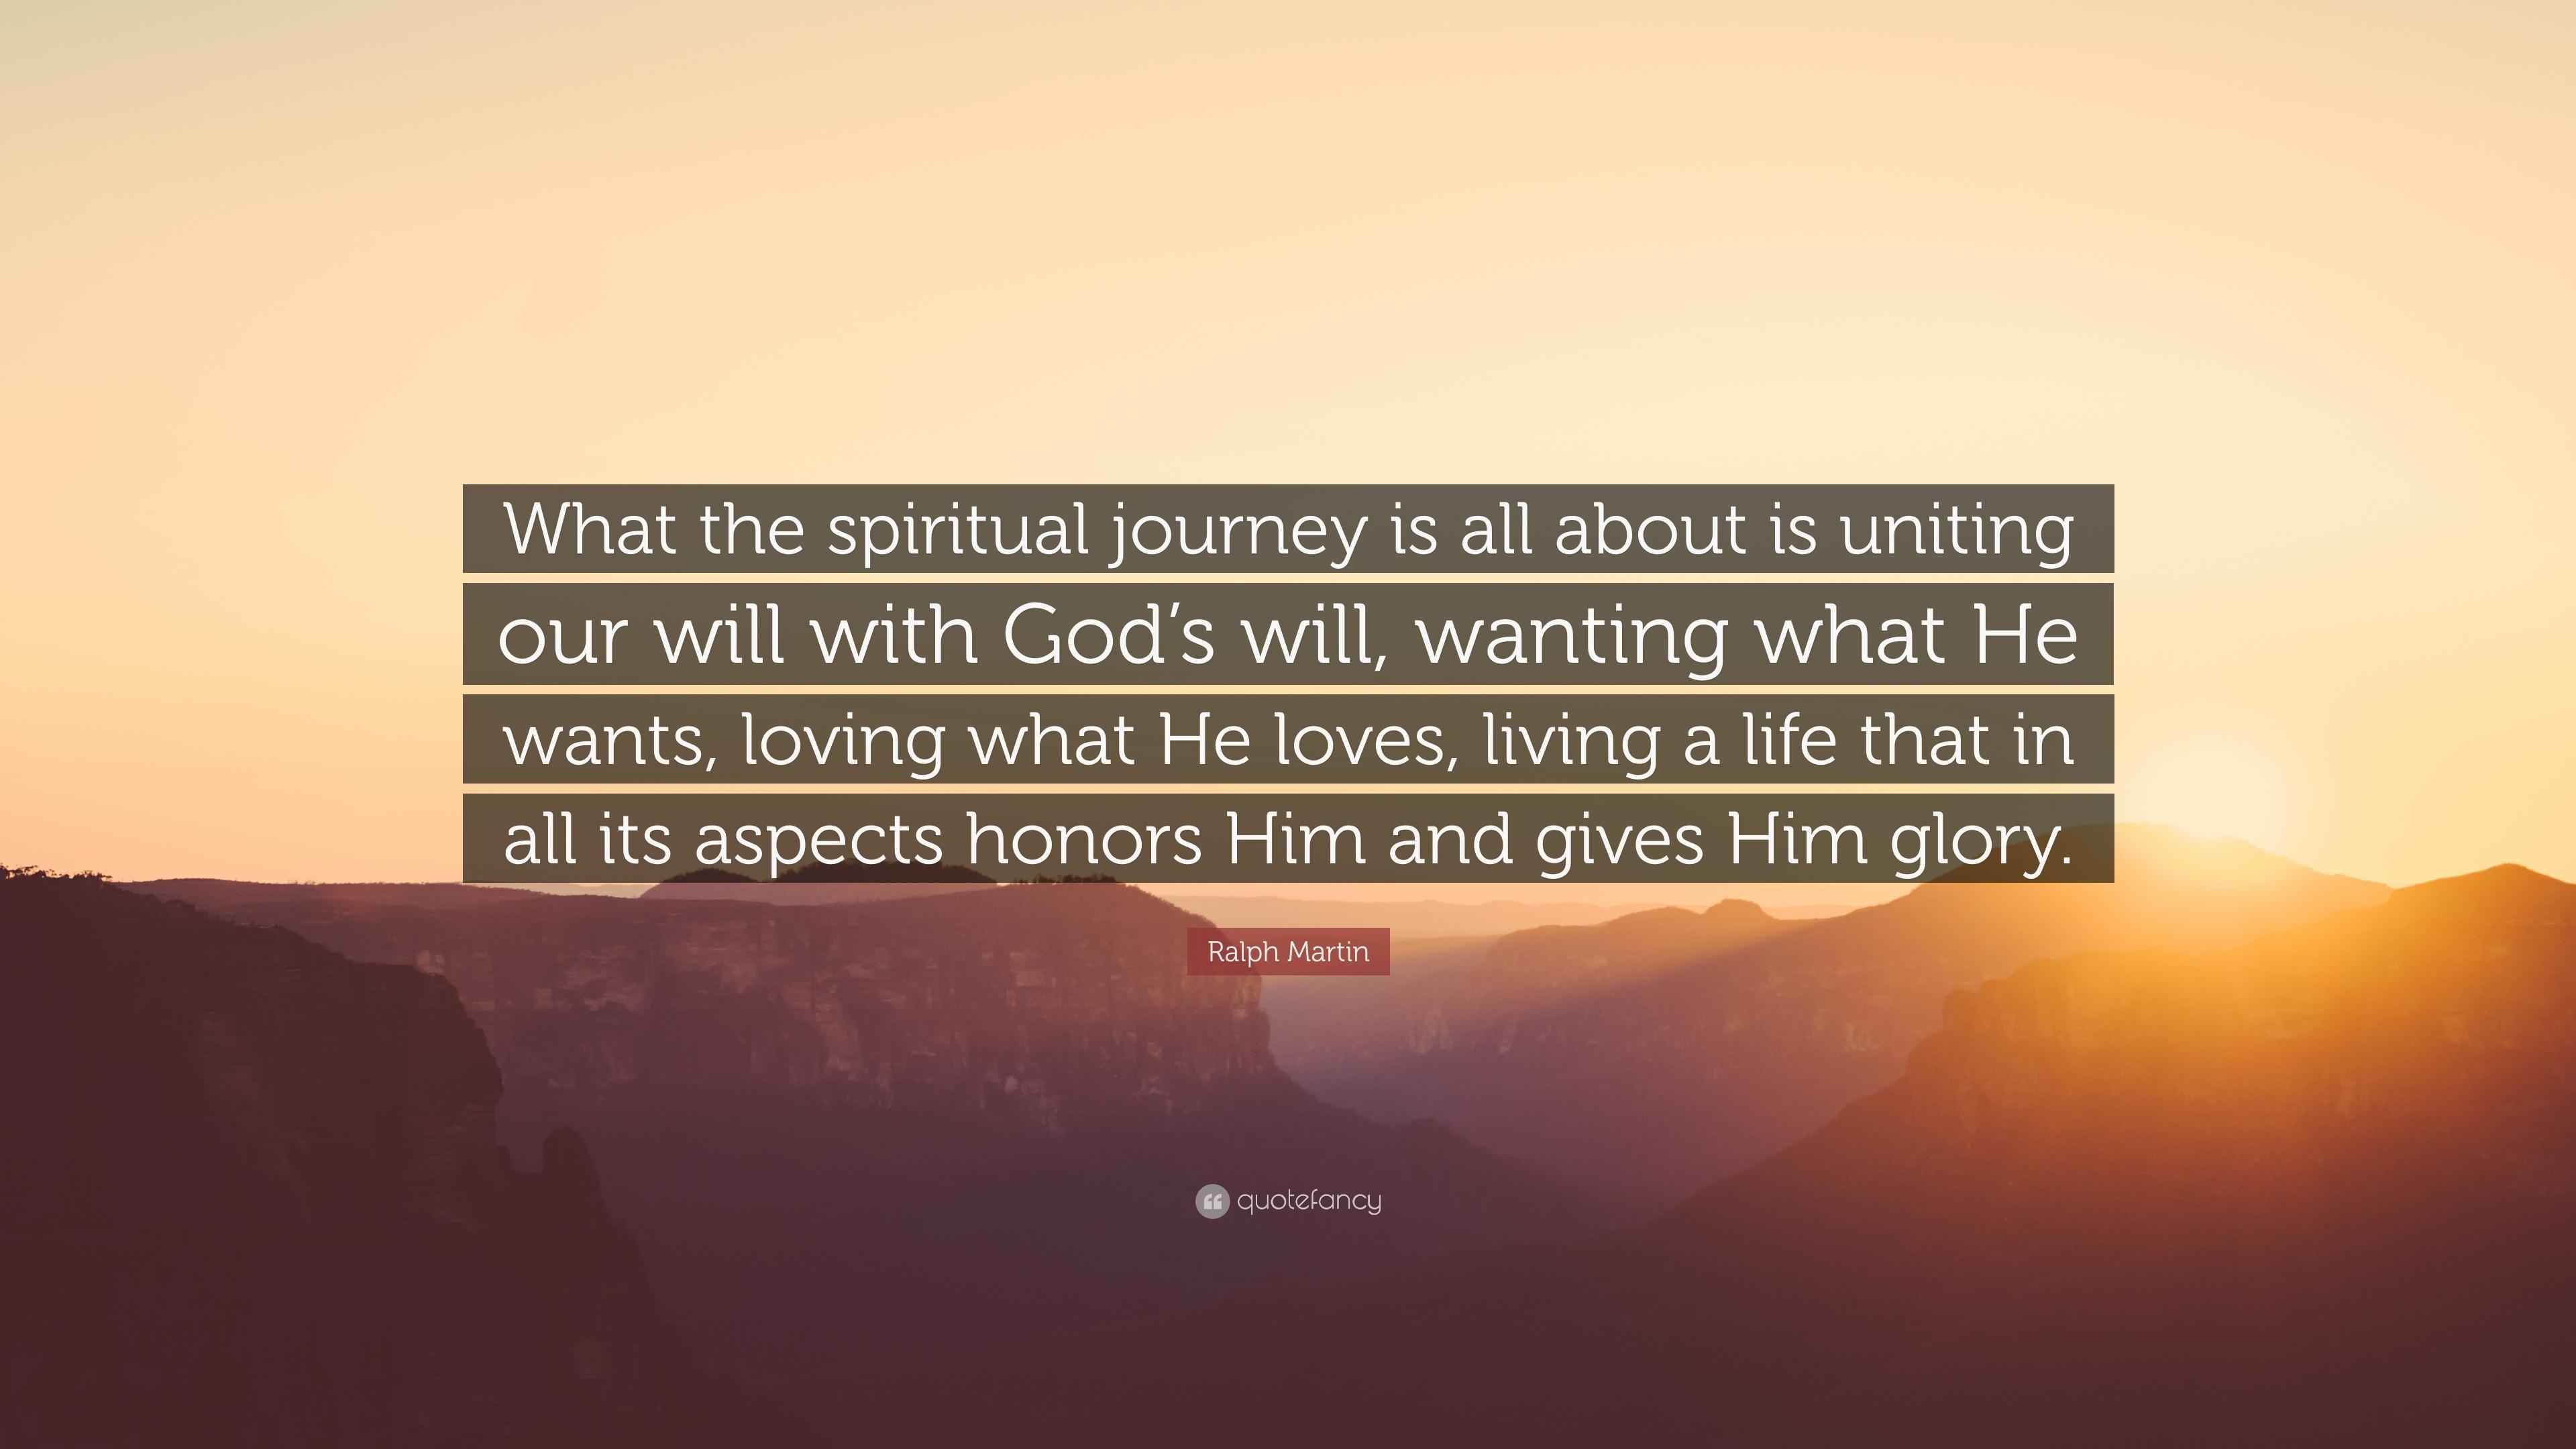 The Three Worlds of the Spiritual Journey